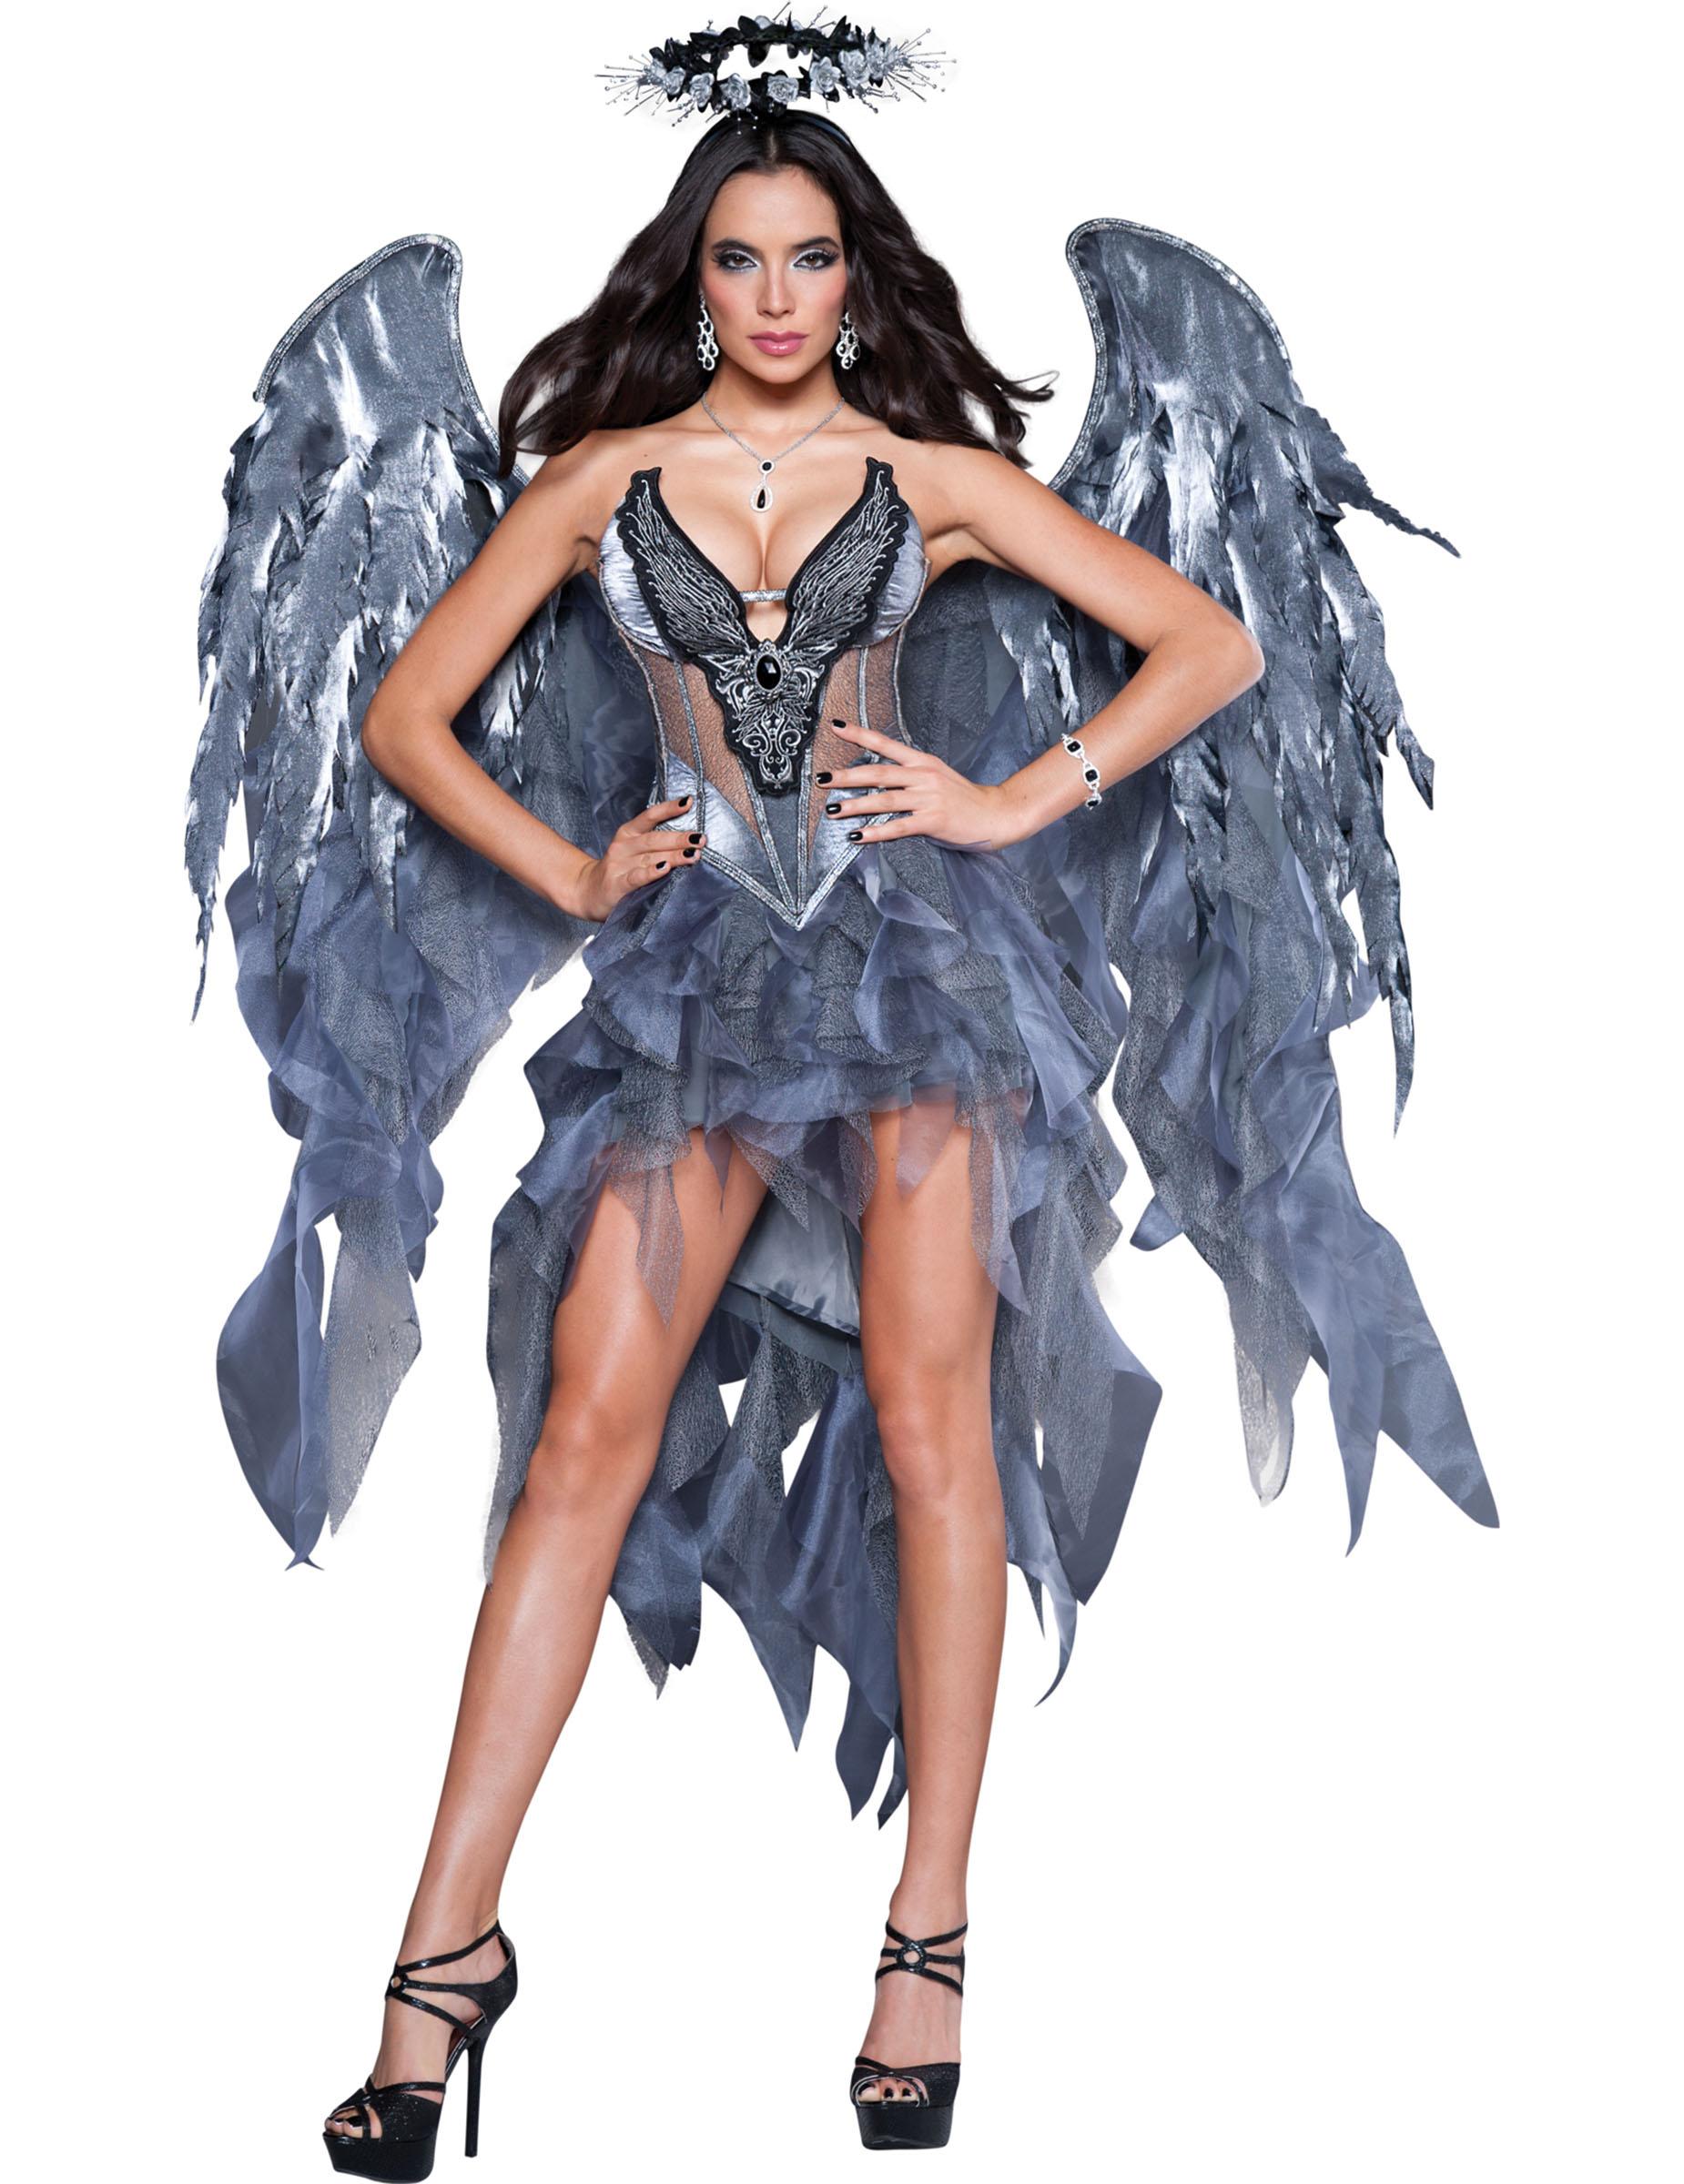 1616e6a9c0882 Höllischer Engel Halloween Kostüm für Damen silber-blau